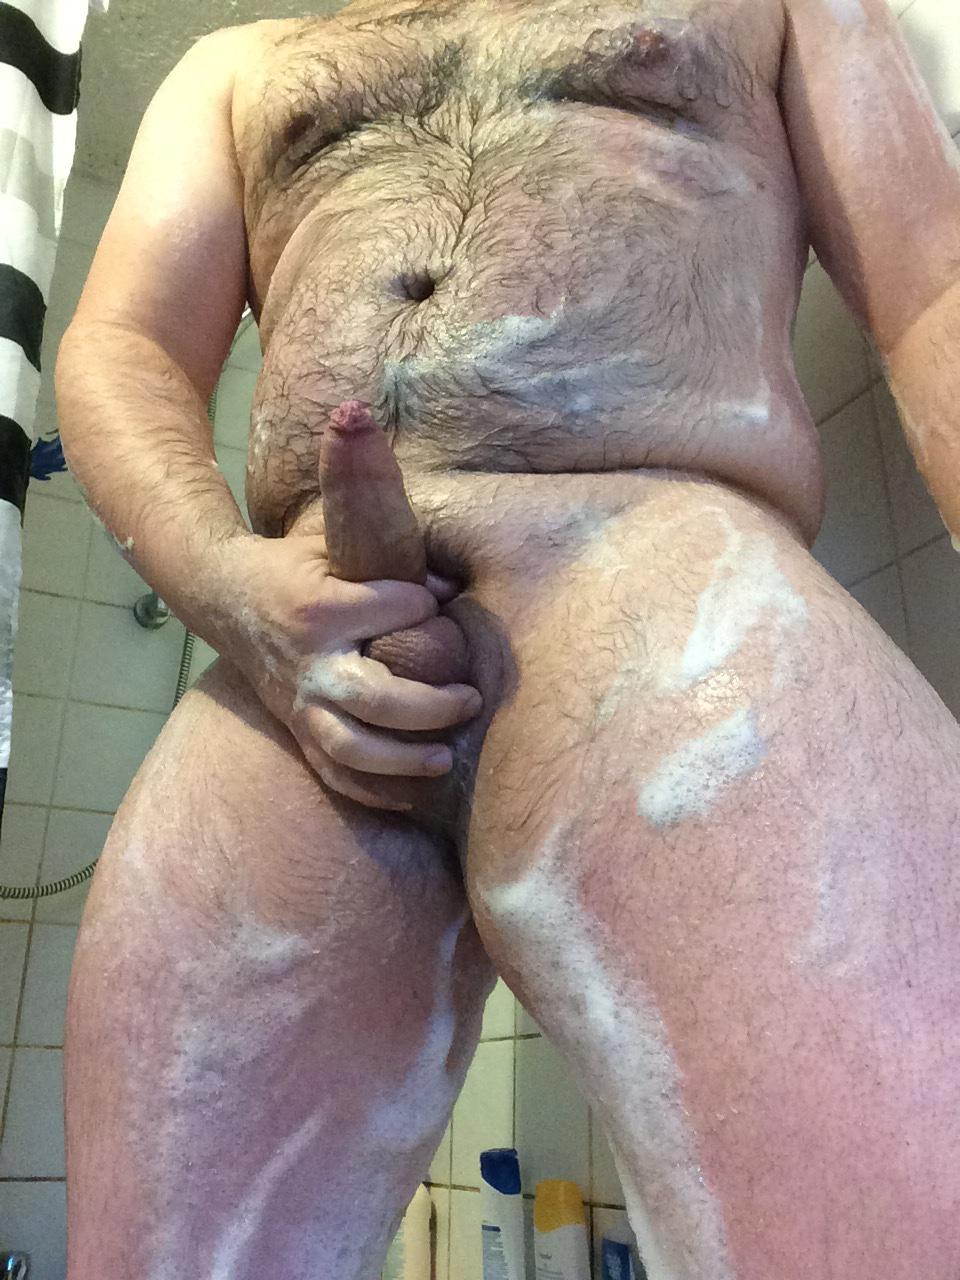 soapy filmed